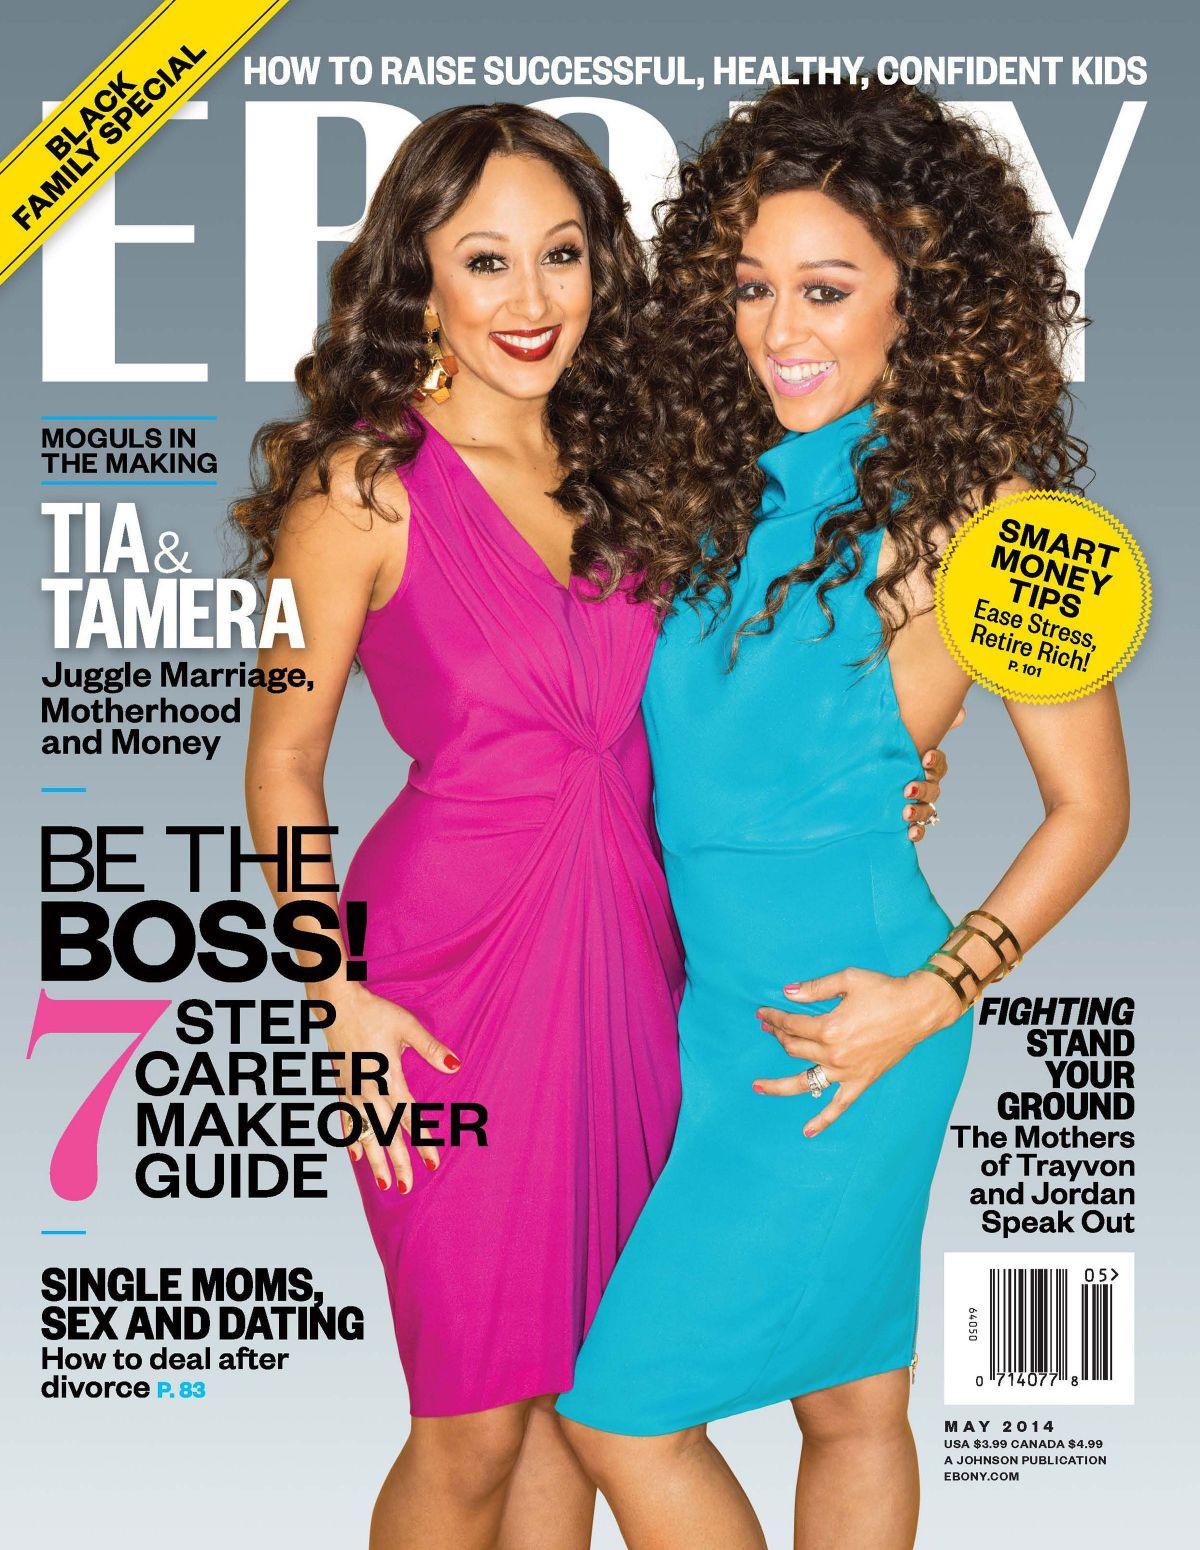 TIA and TAMERA MOWRY in Ebony Magazine, May 2014 Issue